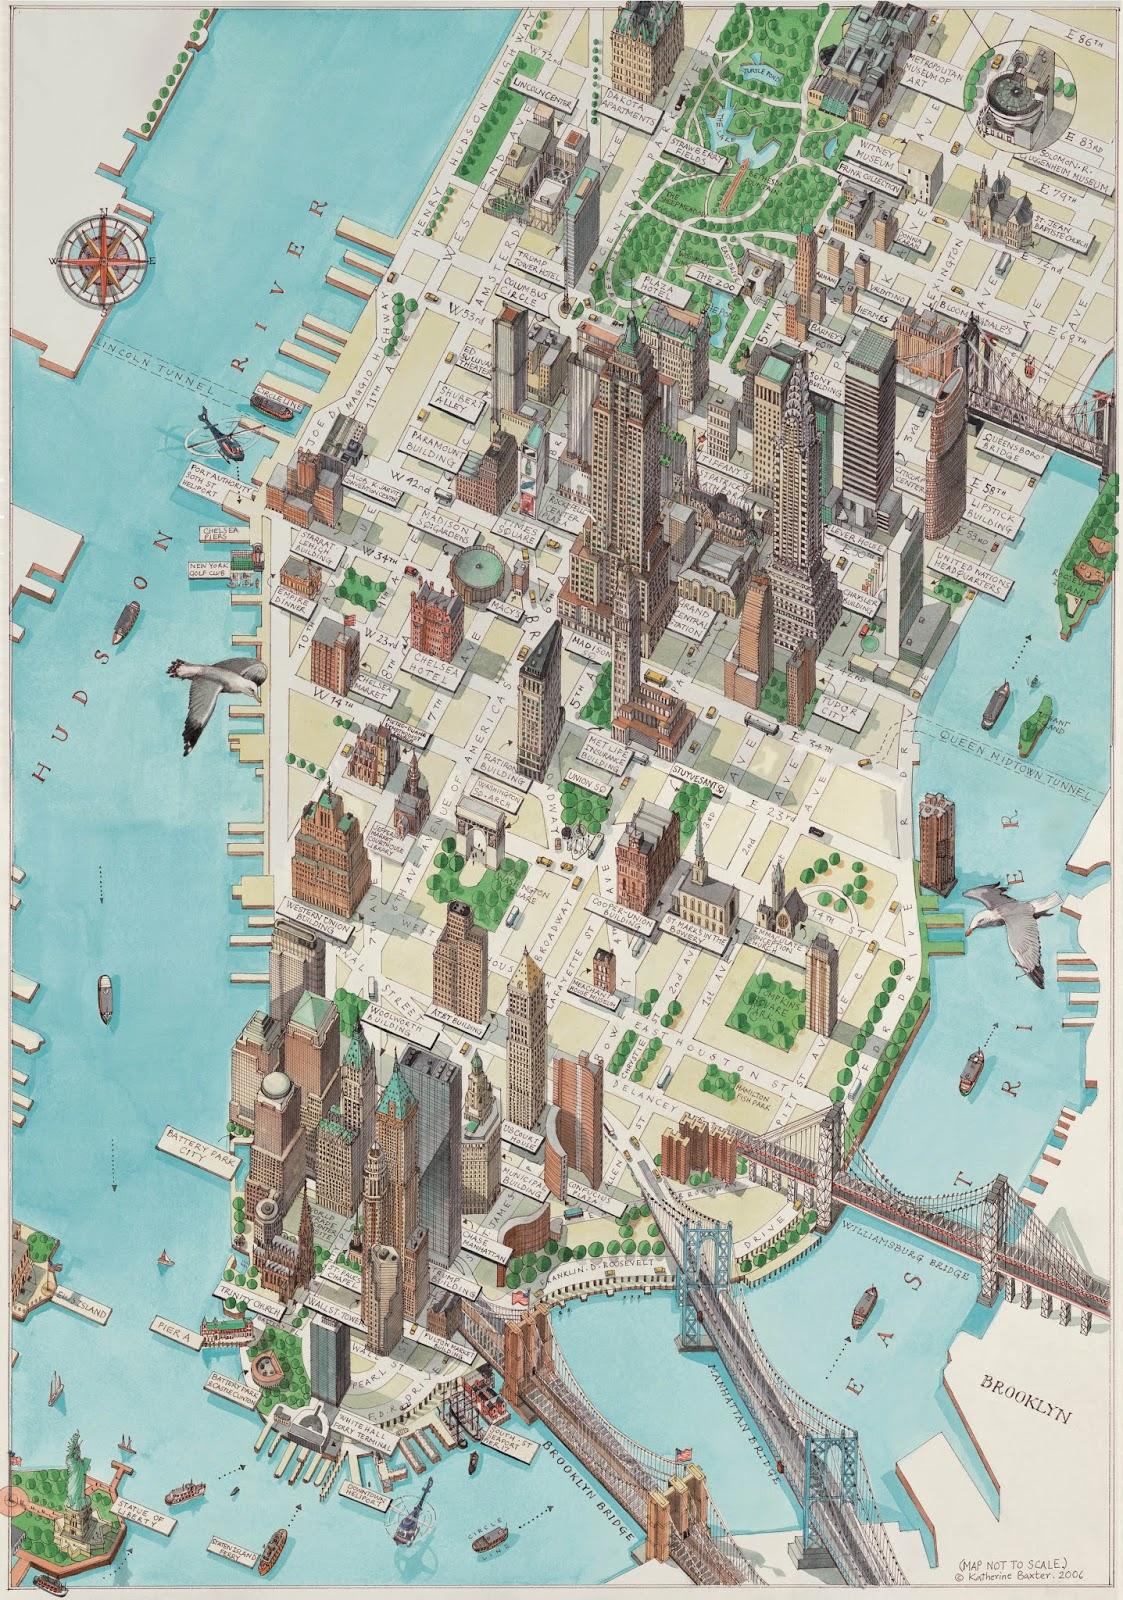 Pdf Of New York Subway Map.Droll Danes